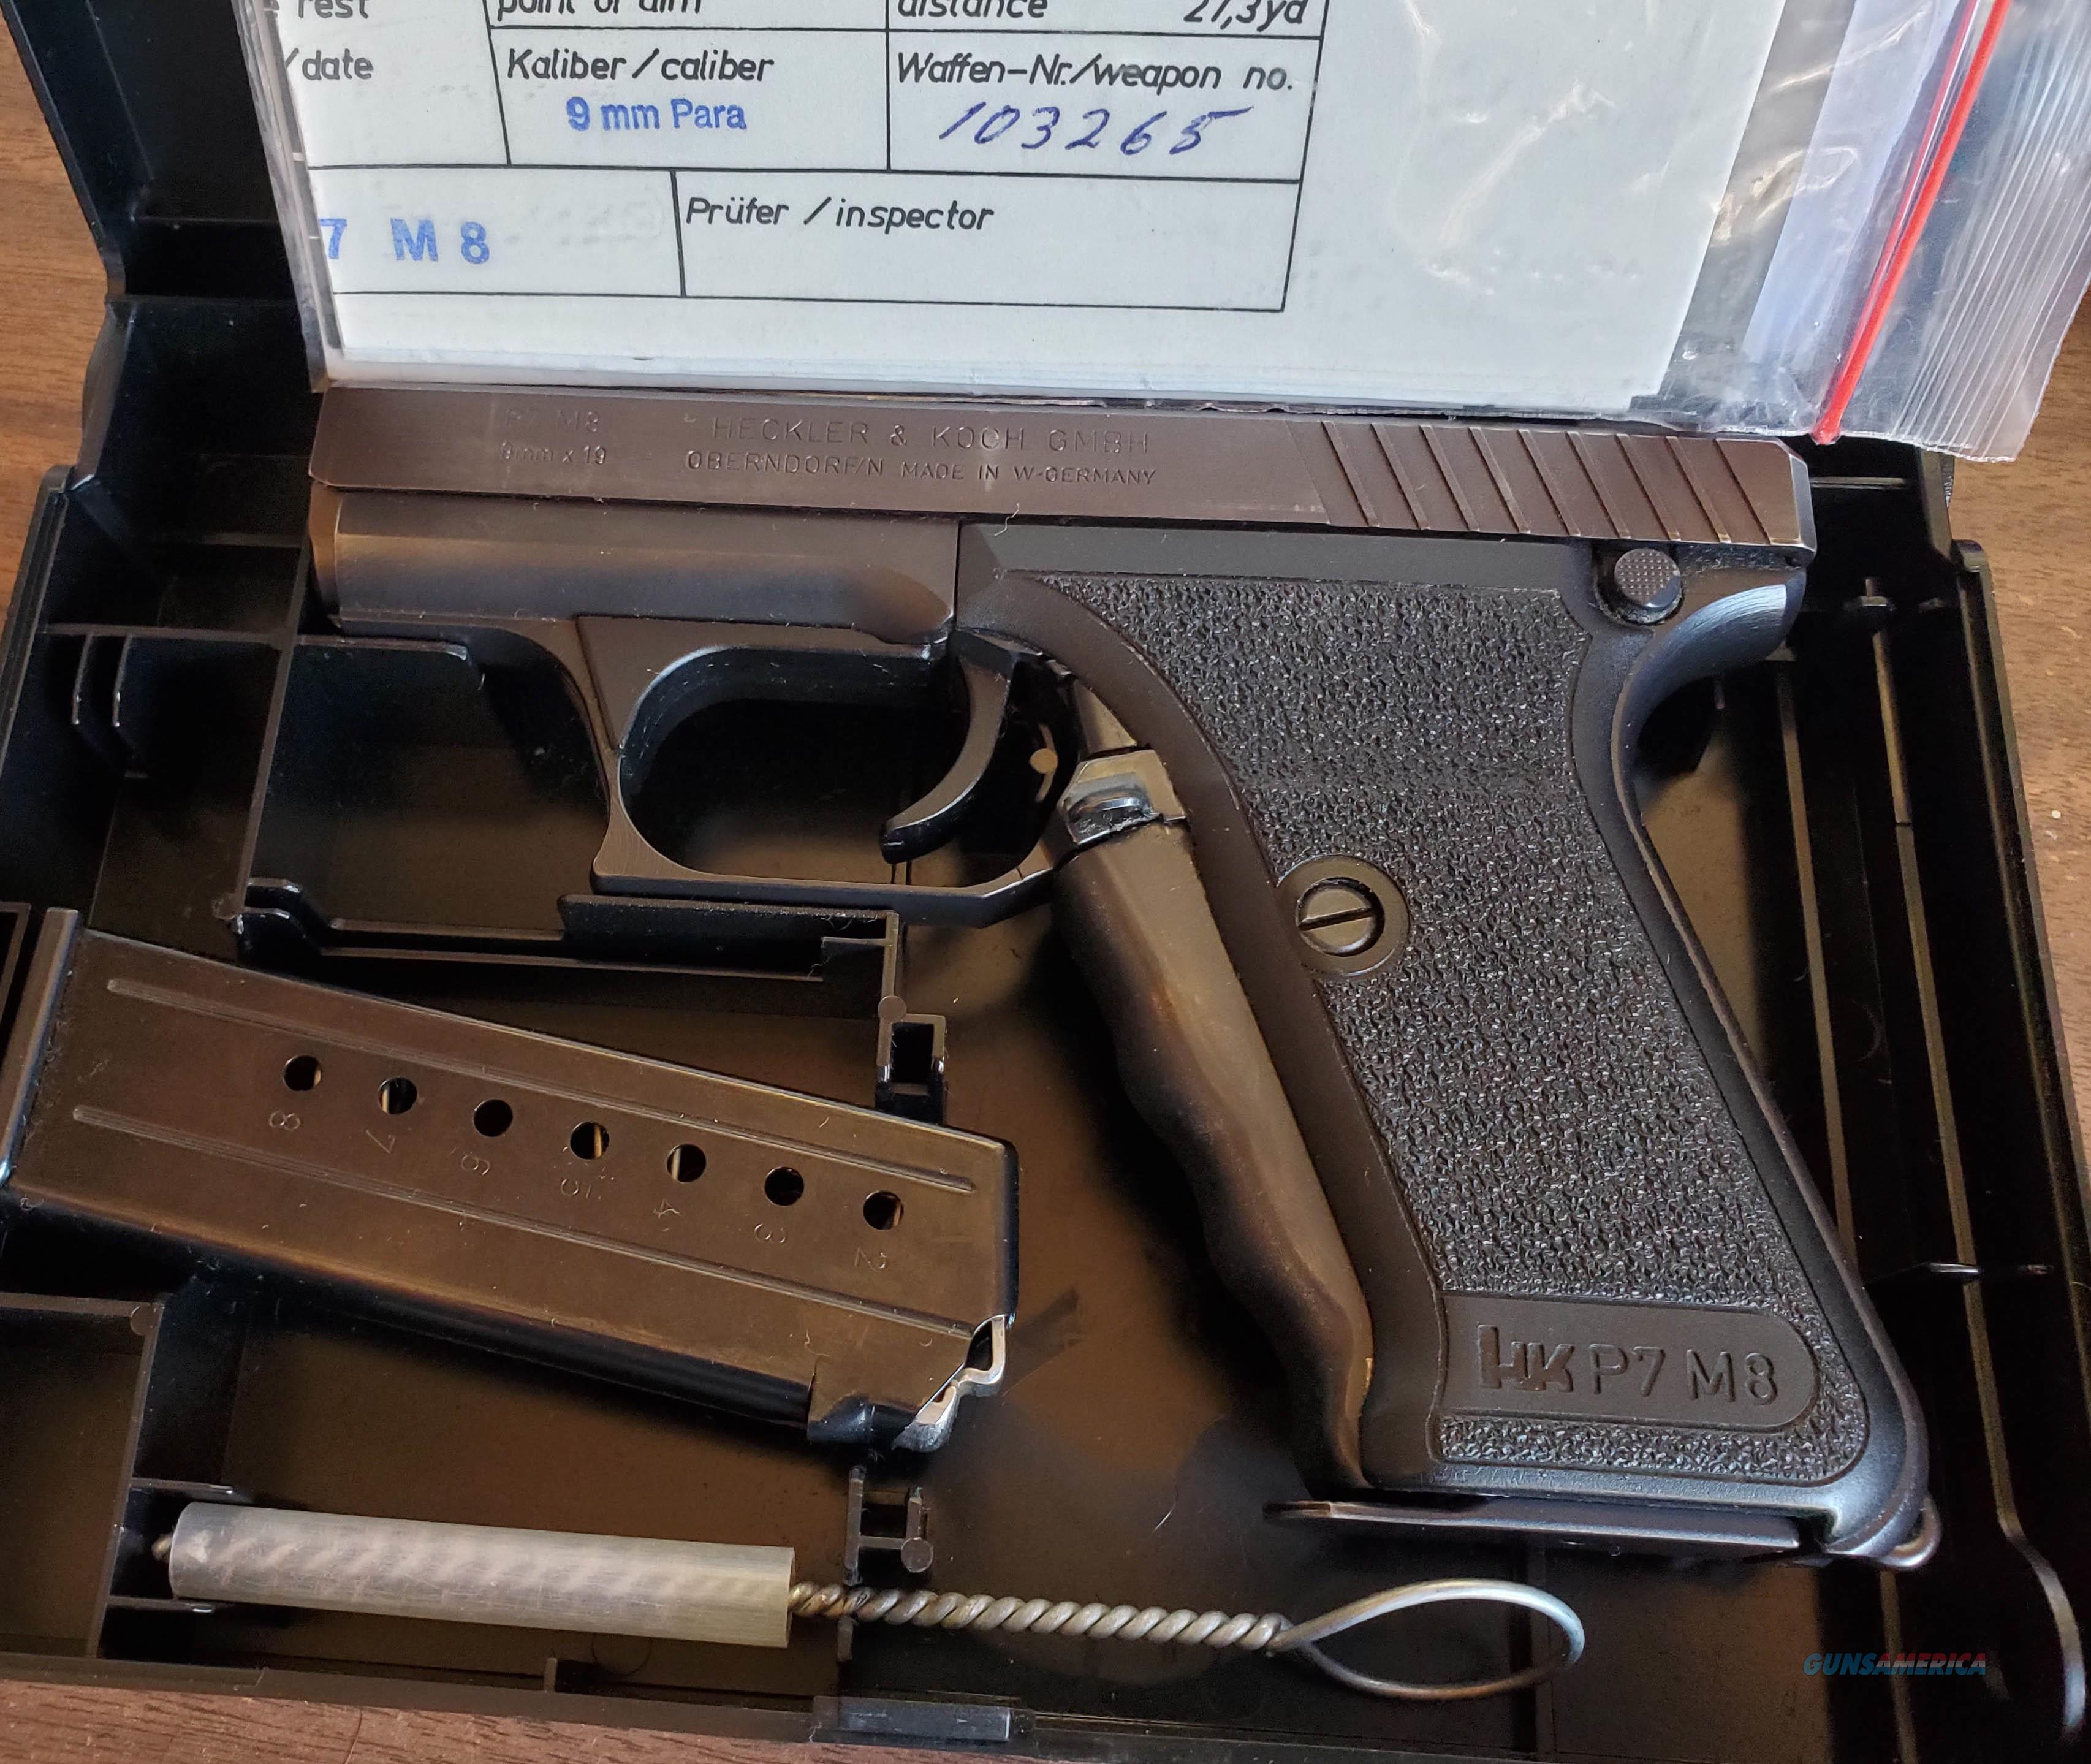 WTS HK P7M8  Guns > Pistols > Heckler & Koch Pistols > SteelFrame